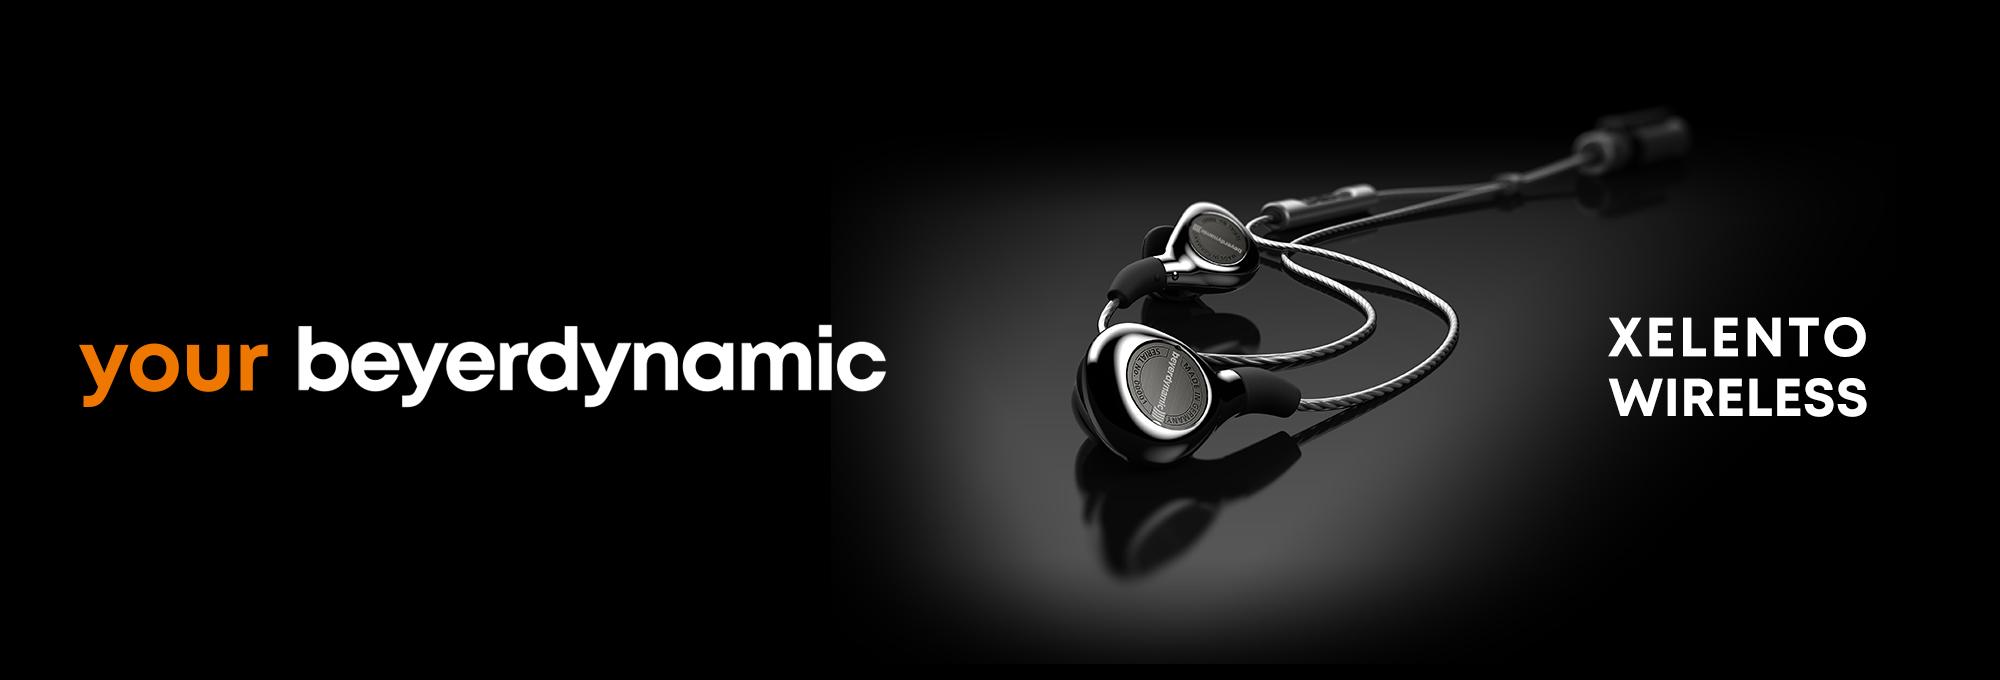 unimy,由你買,beyerdynamic,拜耳動力,XELENTO,wireless,高階耳機,音樂耳機,耳罩式耳機,入耳式耳機,專業耳機,耳機推薦